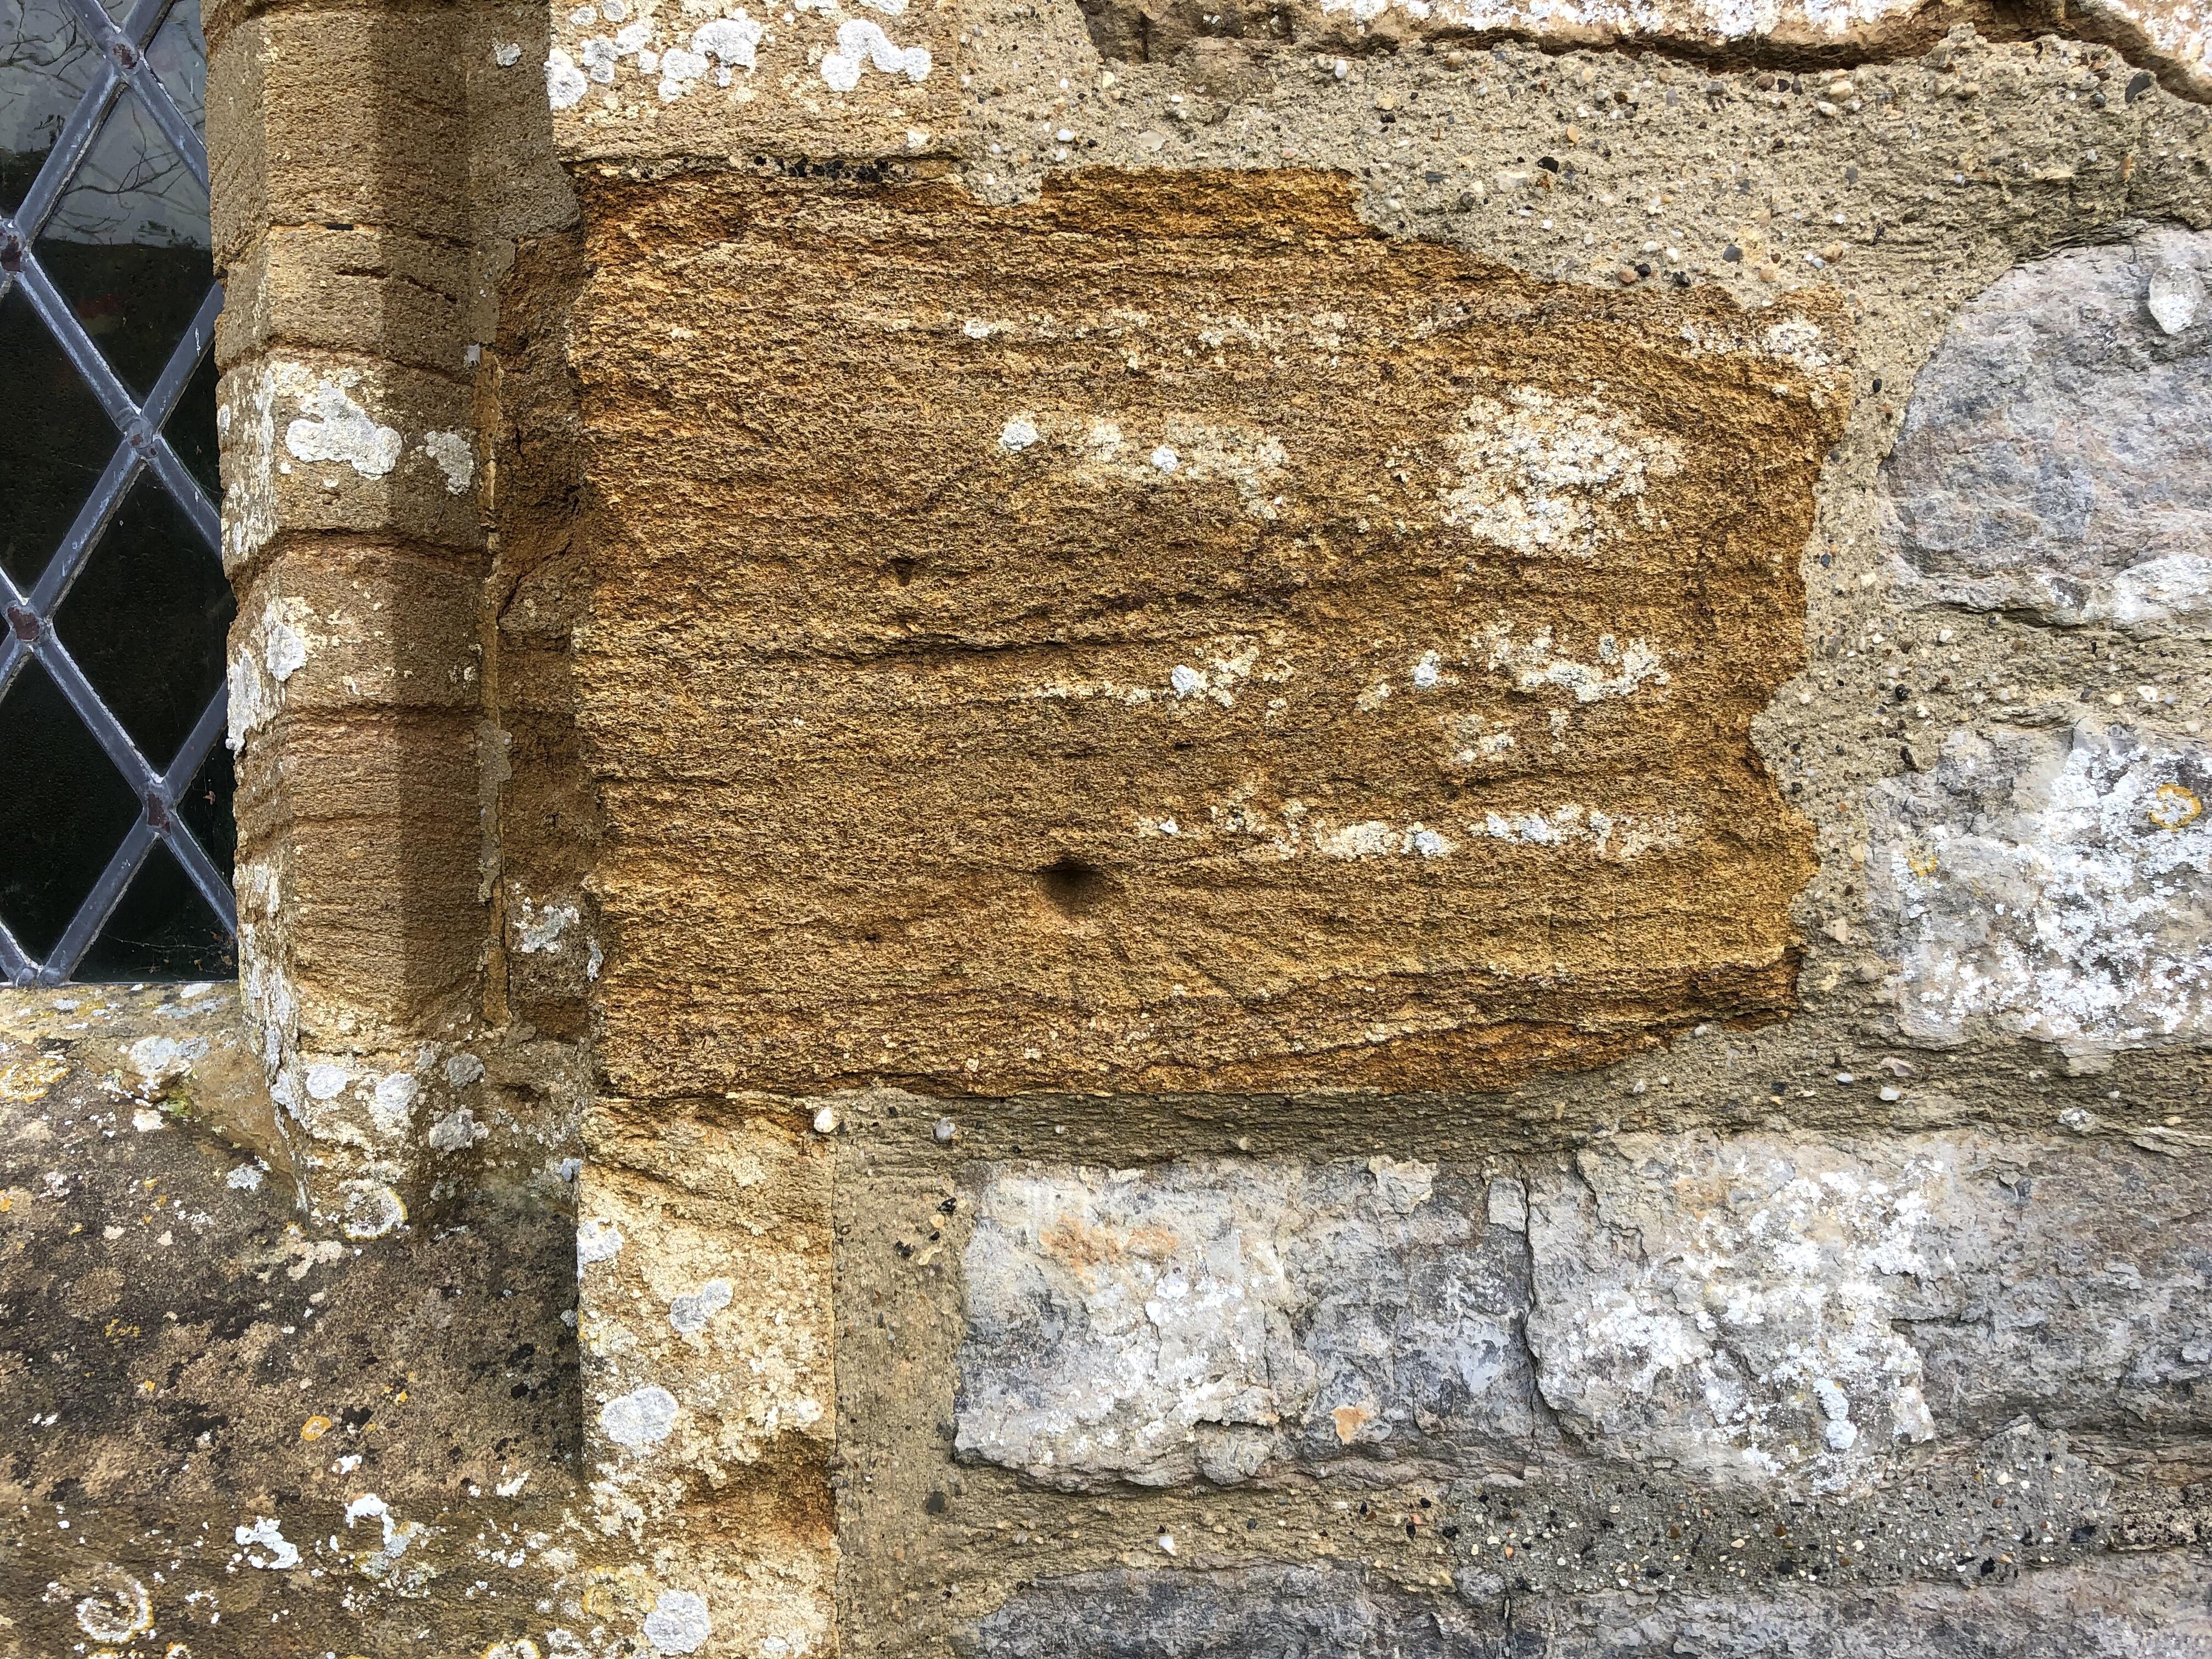 Scratch Dial: St Mary Rimpton Dorset (Keith Salvesen)